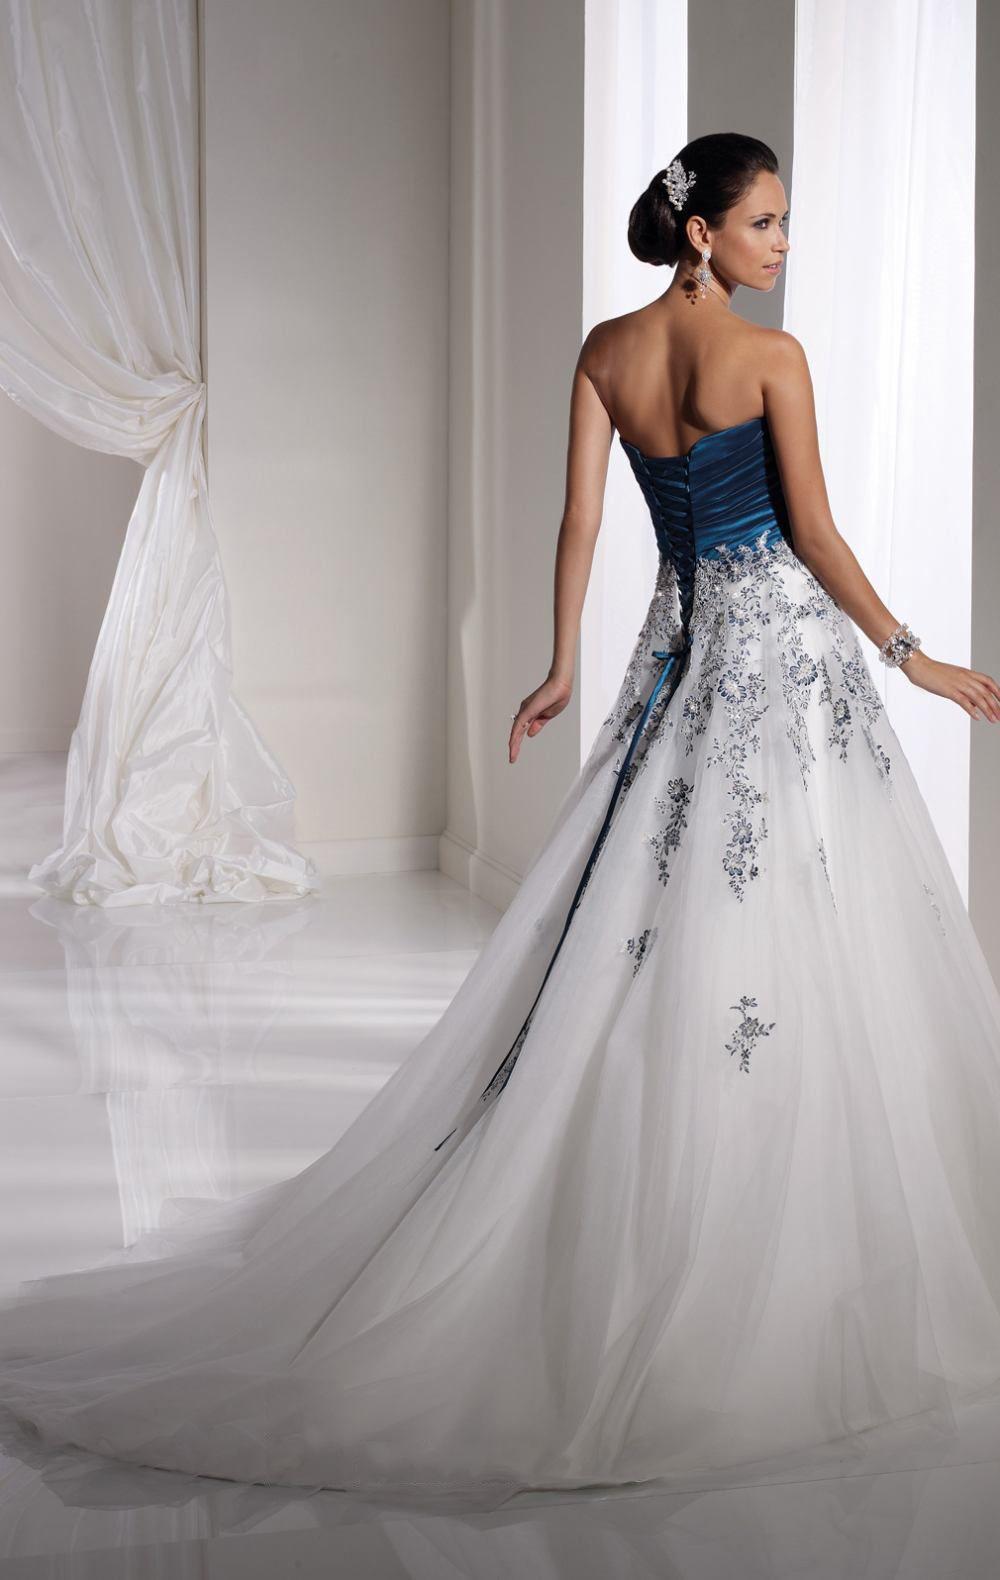 c34c878aff09 Empire Floor Length Strapless Dress White Blue Bandage Destination Wedding  Gowns 1153 Applique Flower [Weddingdresses002526] - £154.99 : Wedding  Dresses ...